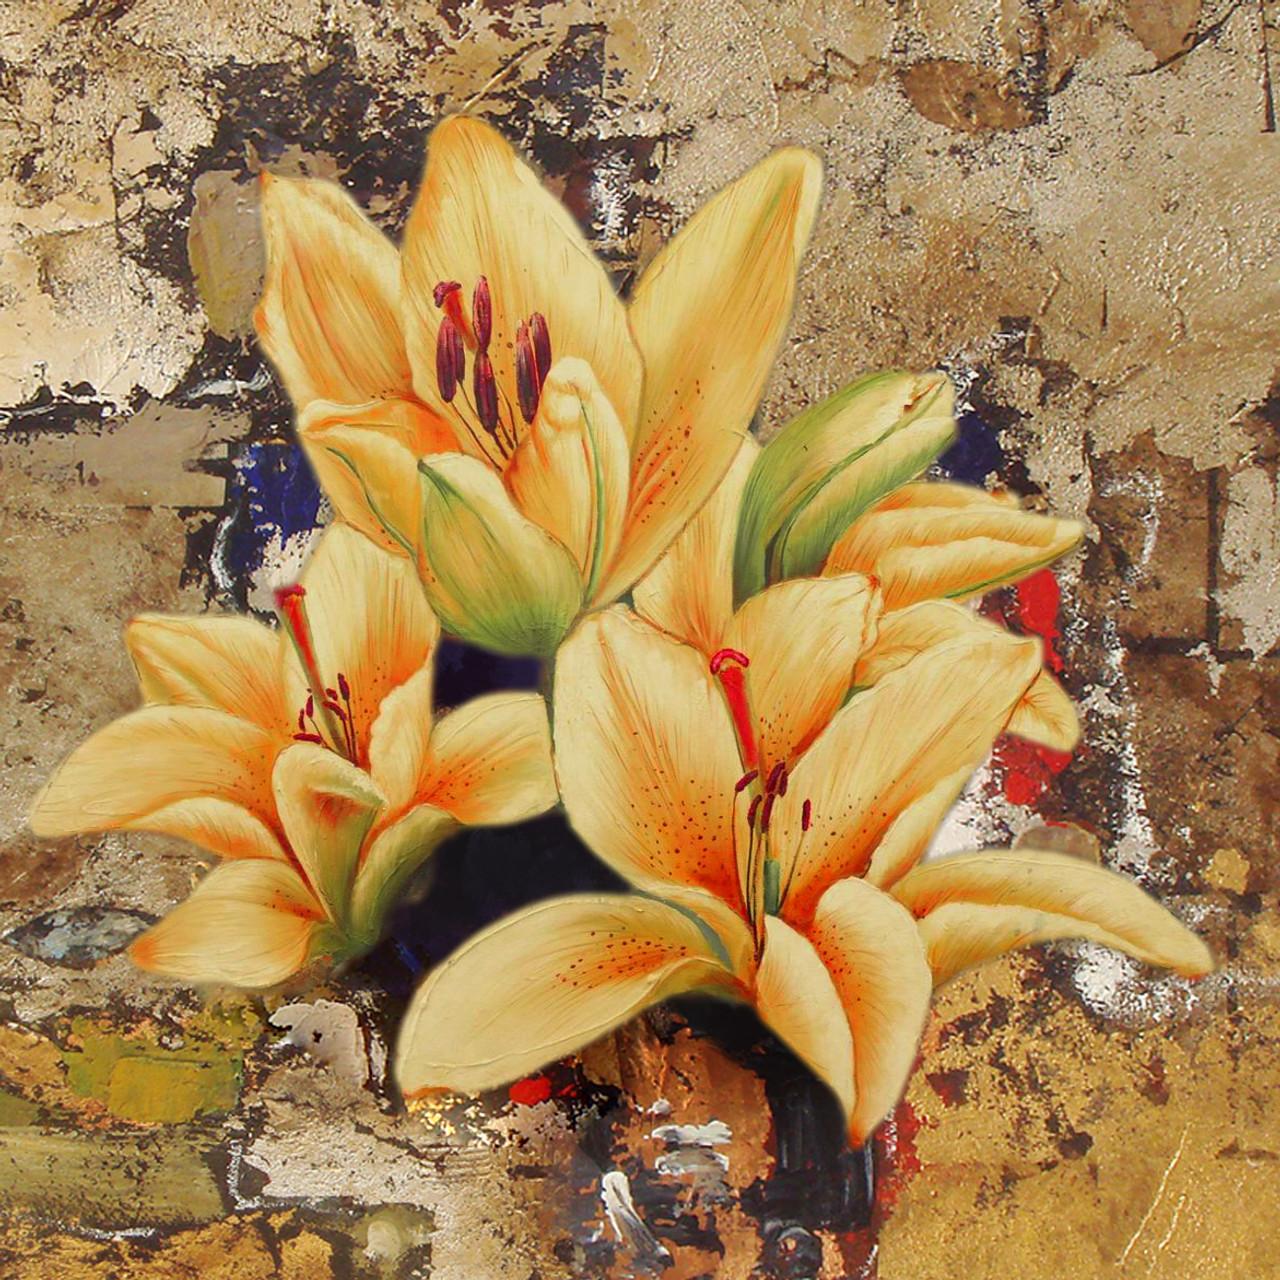 Yellow flowers 24in x 24in floralslatest collection buy yellow flowers 24in x 24in28flower1672424yellow brownrs1890 mightylinksfo